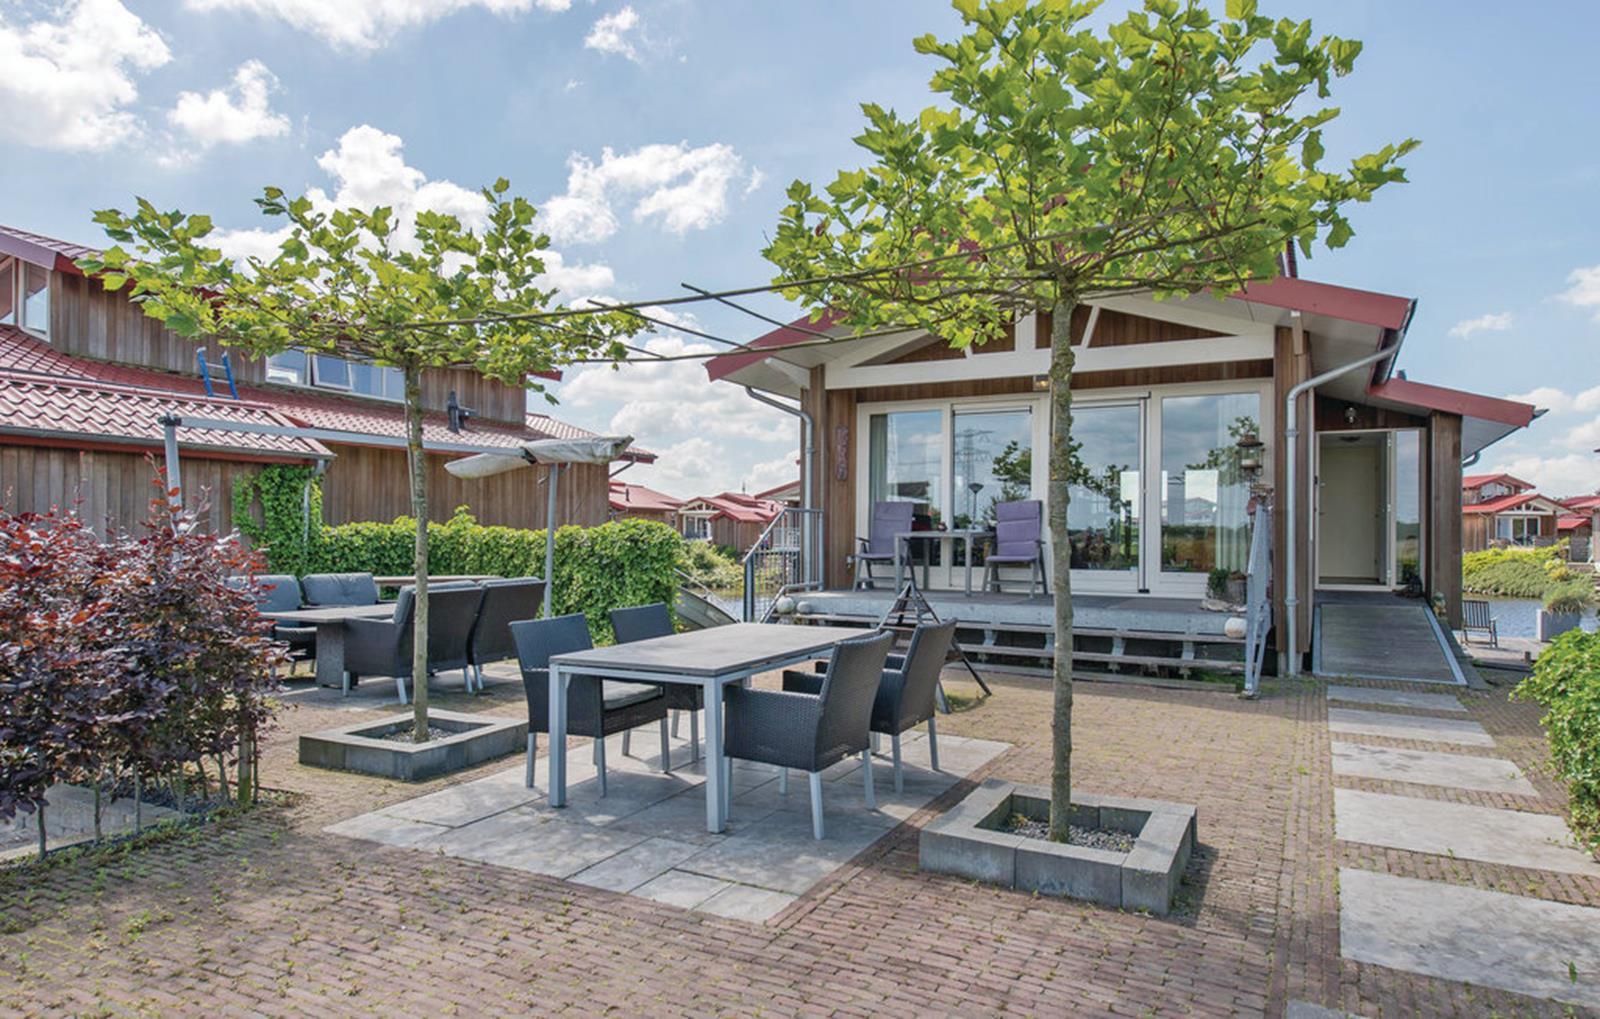 Vakantiehuis te koop Friesland Noardburgum 025.jpg